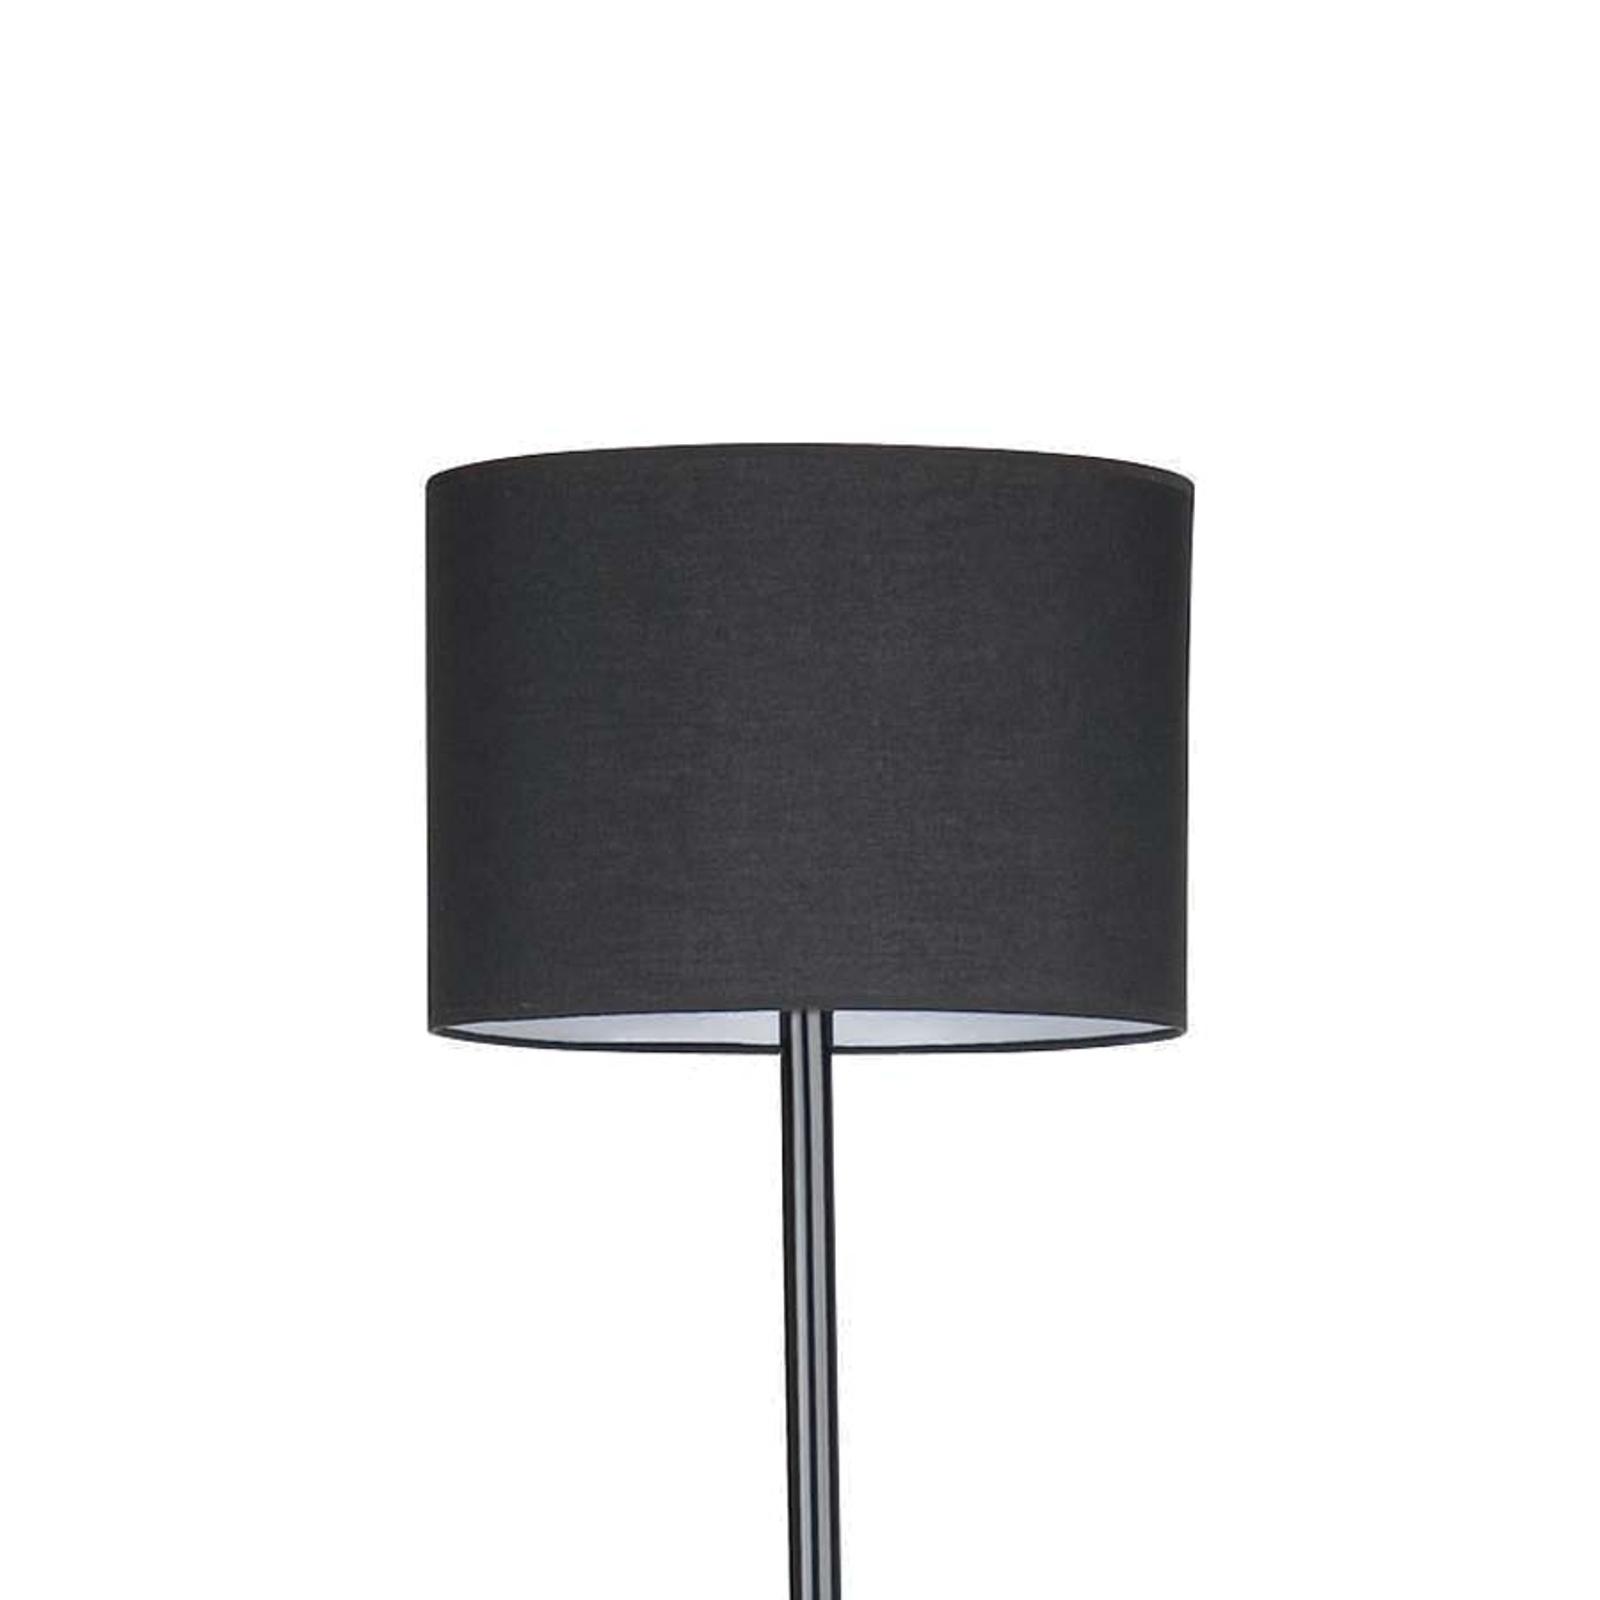 Imponująca lampa stojąca Black